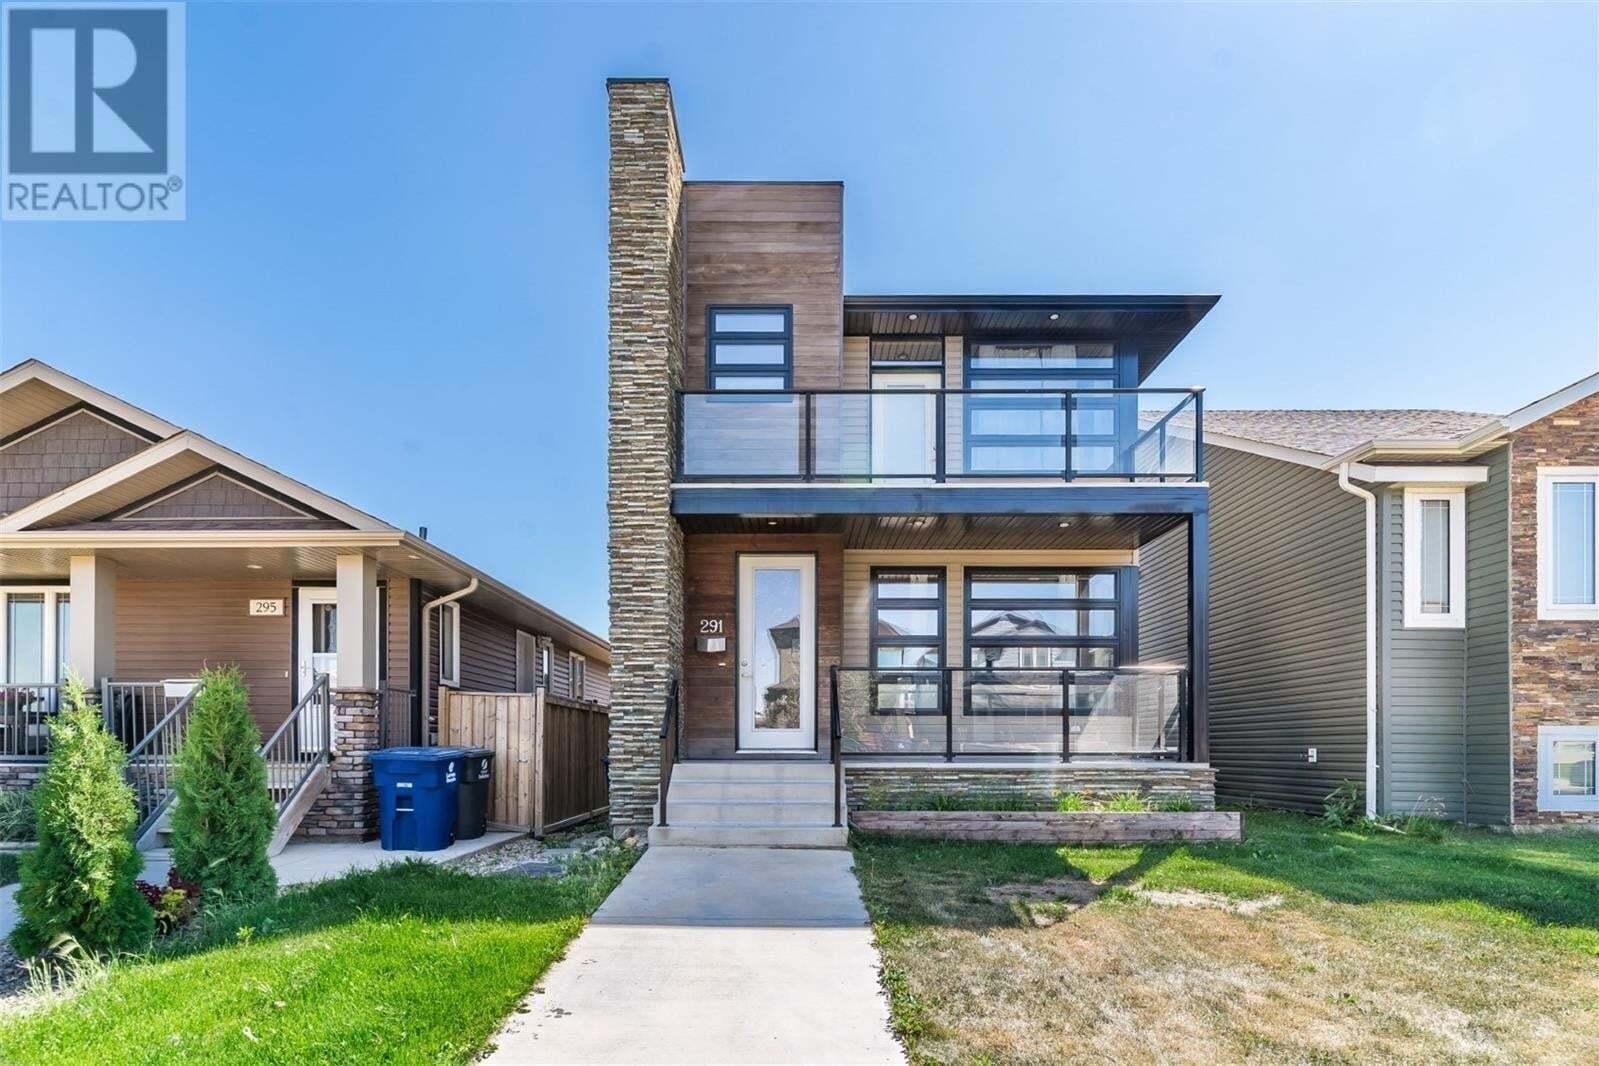 House for sale at 291 Wyant Ln Saskatoon Saskatchewan - MLS: SK819642